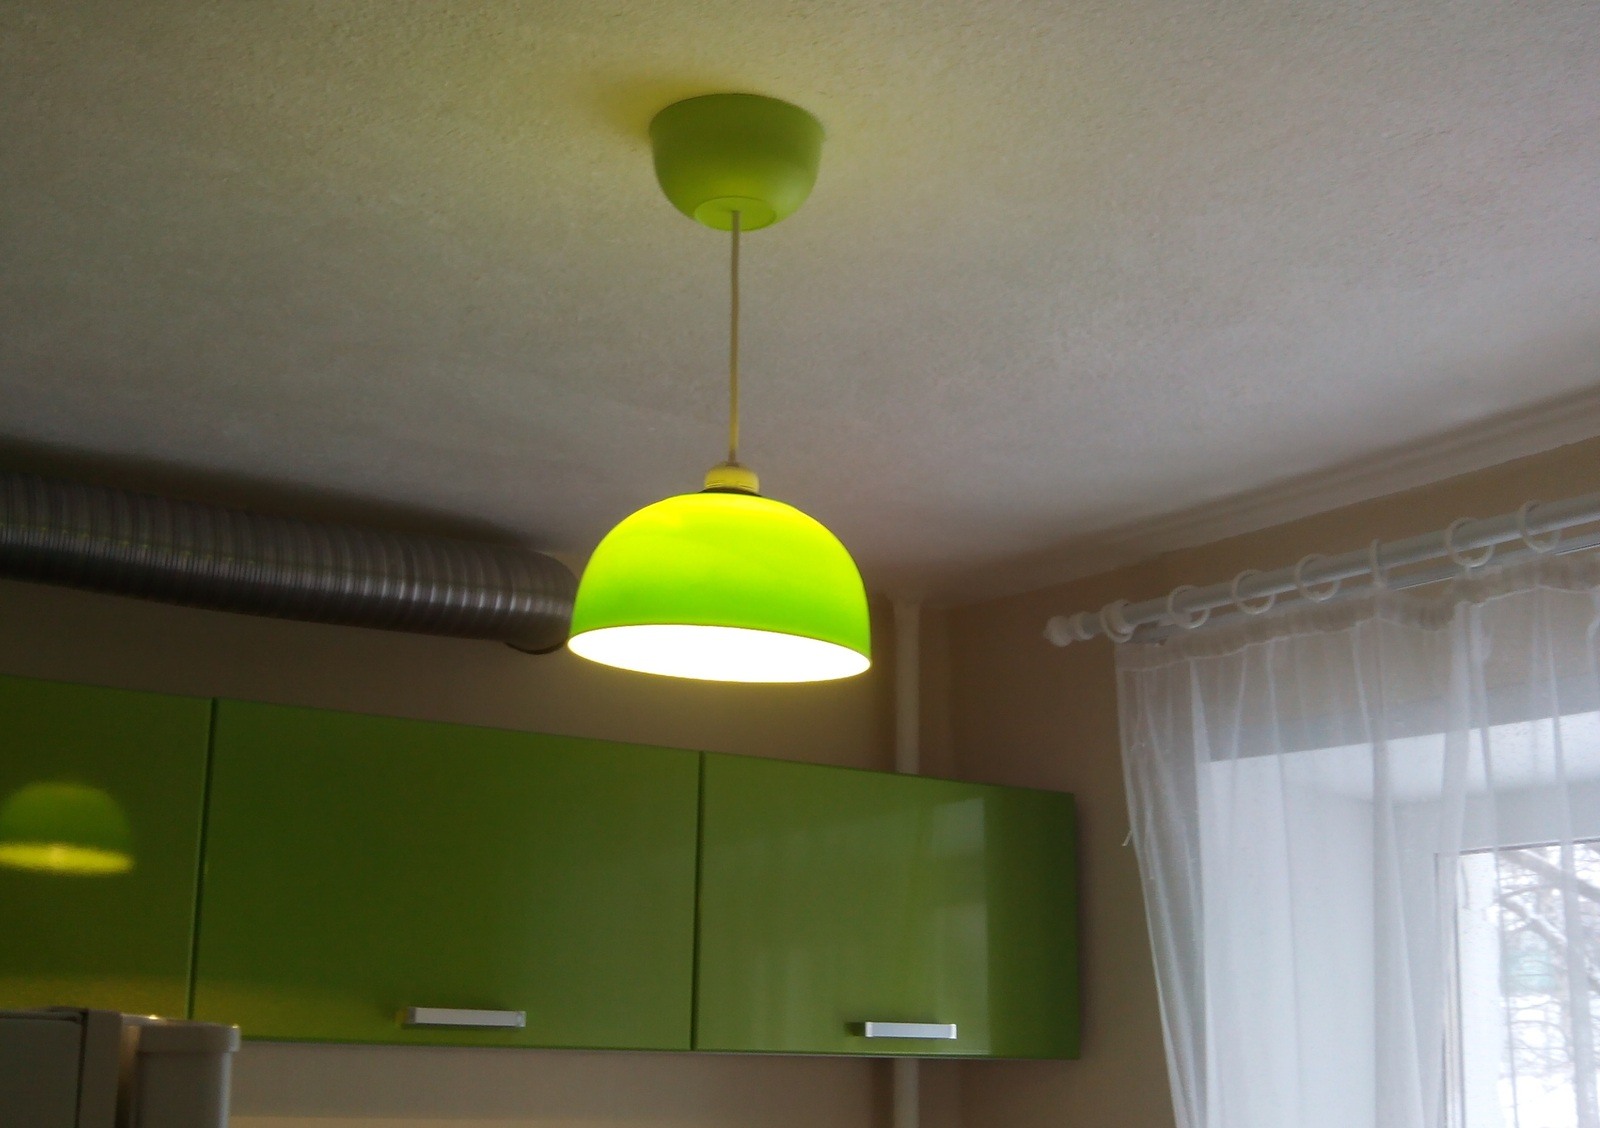 Абажур для люстры на кухне своими руками фото 638